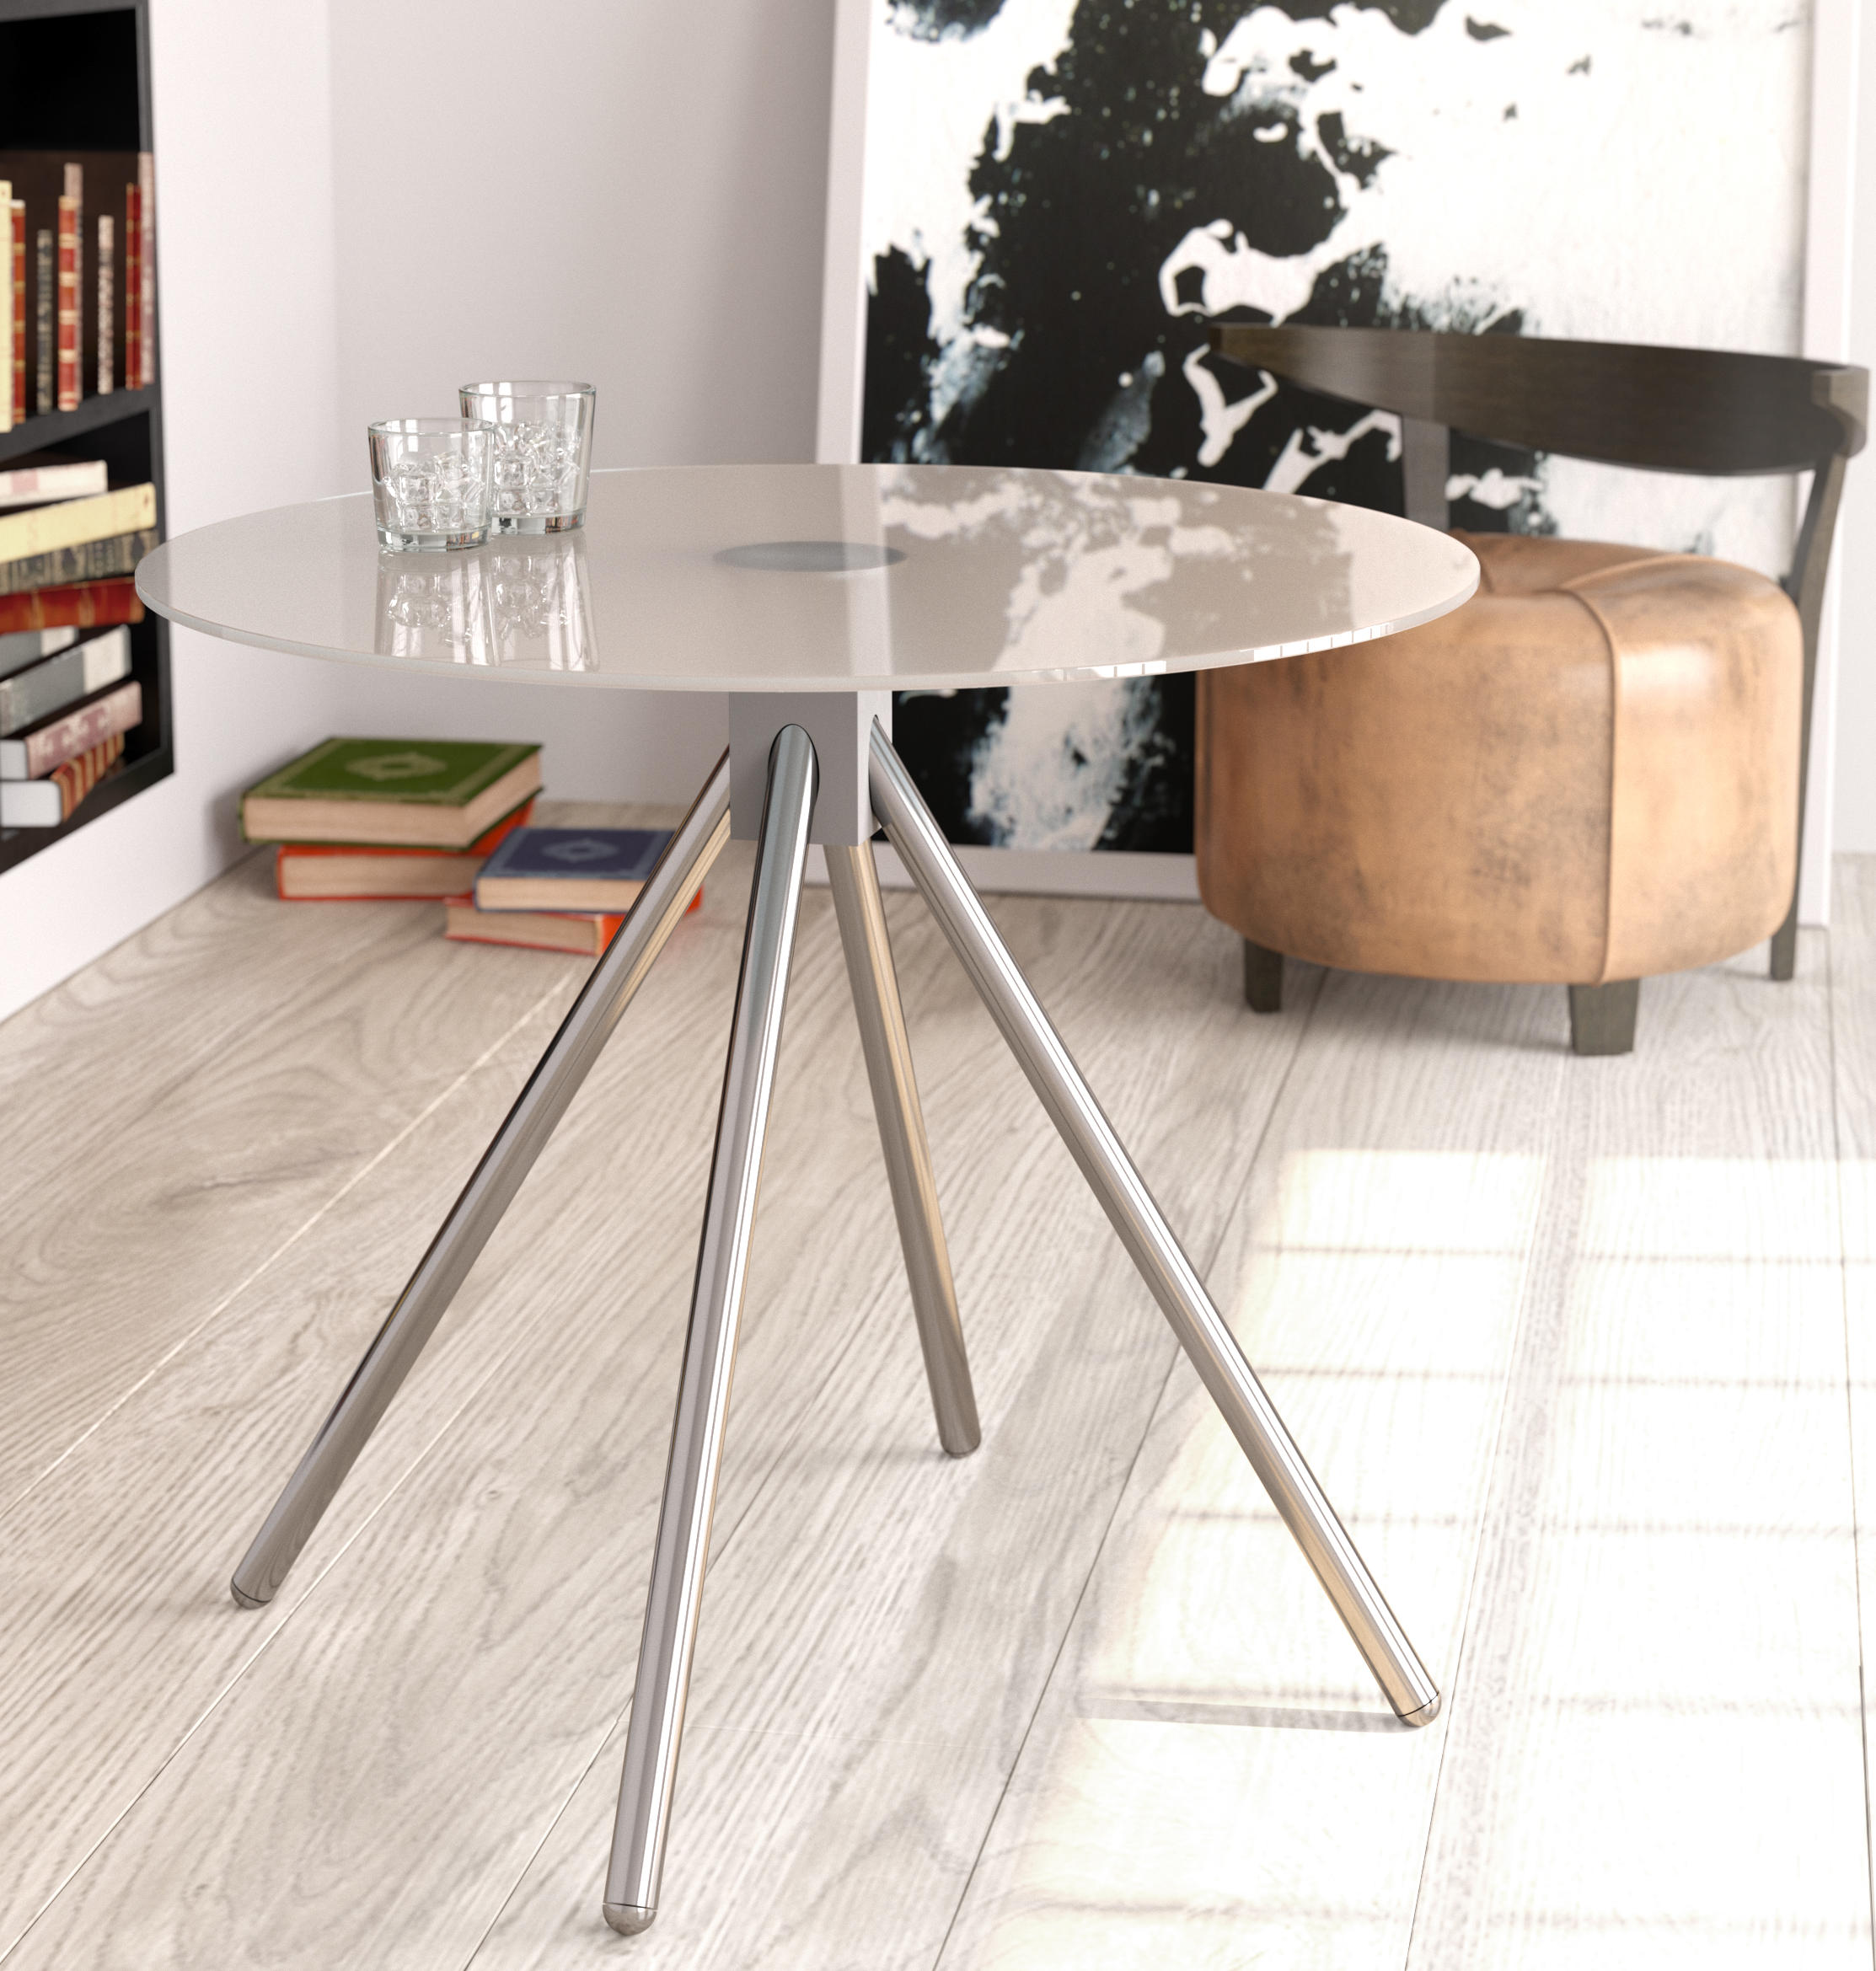 tischgestell x200 edelstahl f r holz oder glasplatten tischgestell x200 tischgestelle. Black Bedroom Furniture Sets. Home Design Ideas